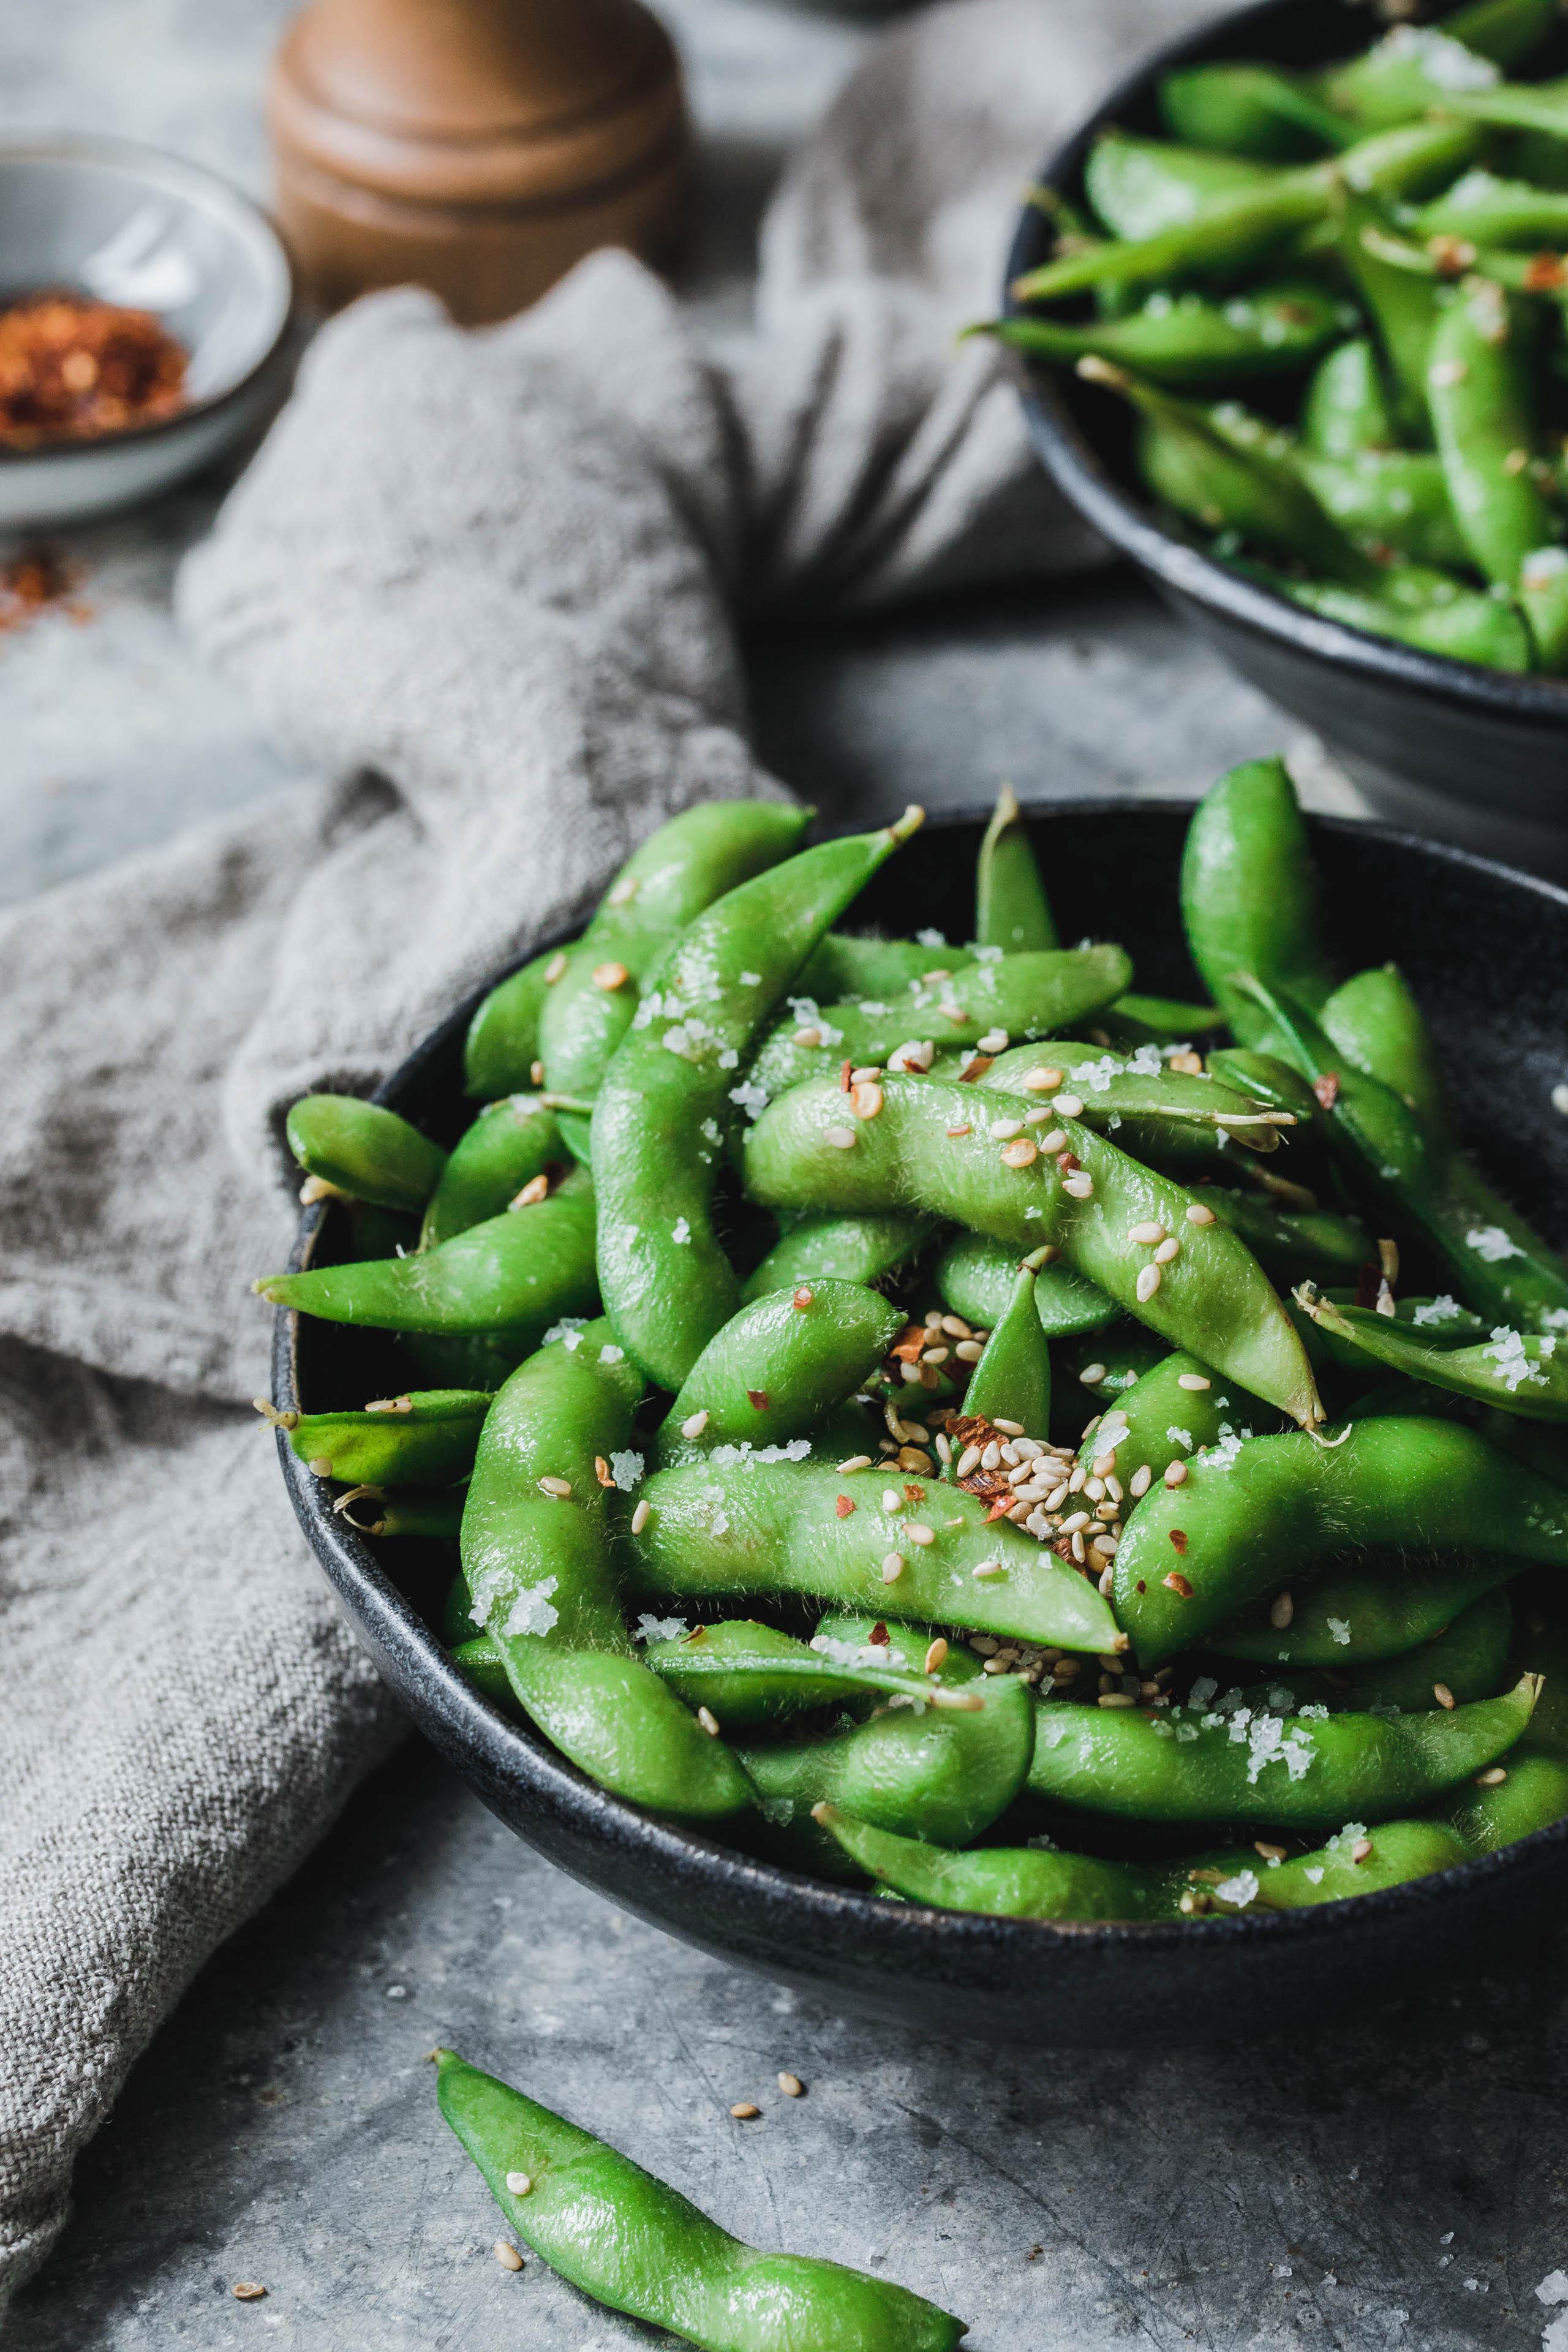 edamame mit sesam chili eat this foodblog vegane rezepte stories. Black Bedroom Furniture Sets. Home Design Ideas